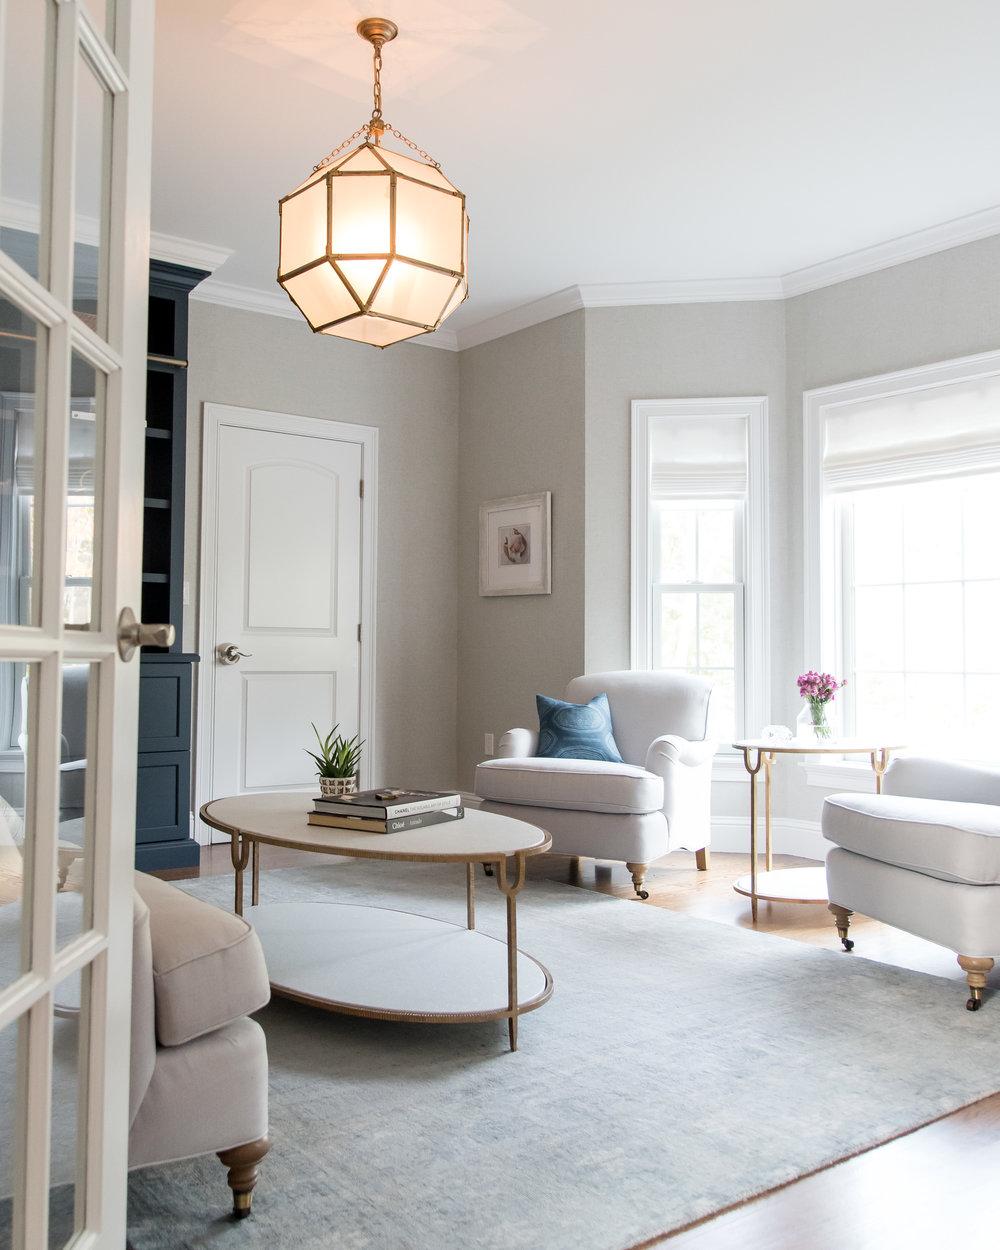 little meadow  gina baran interiors and design north reading luxury designer